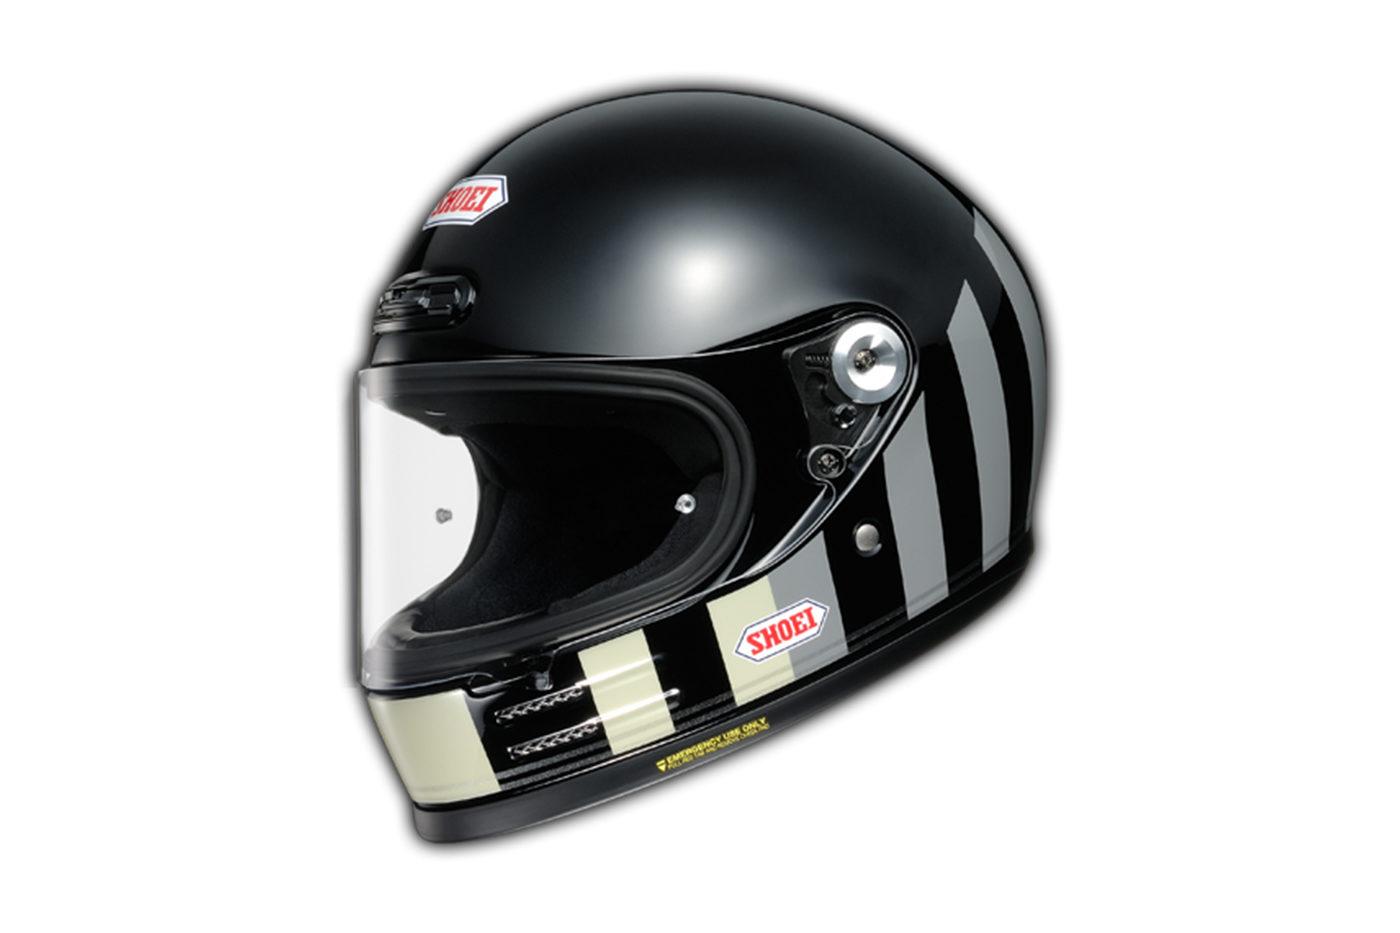 Shoei Glamster Retro Motorcycle Helmet